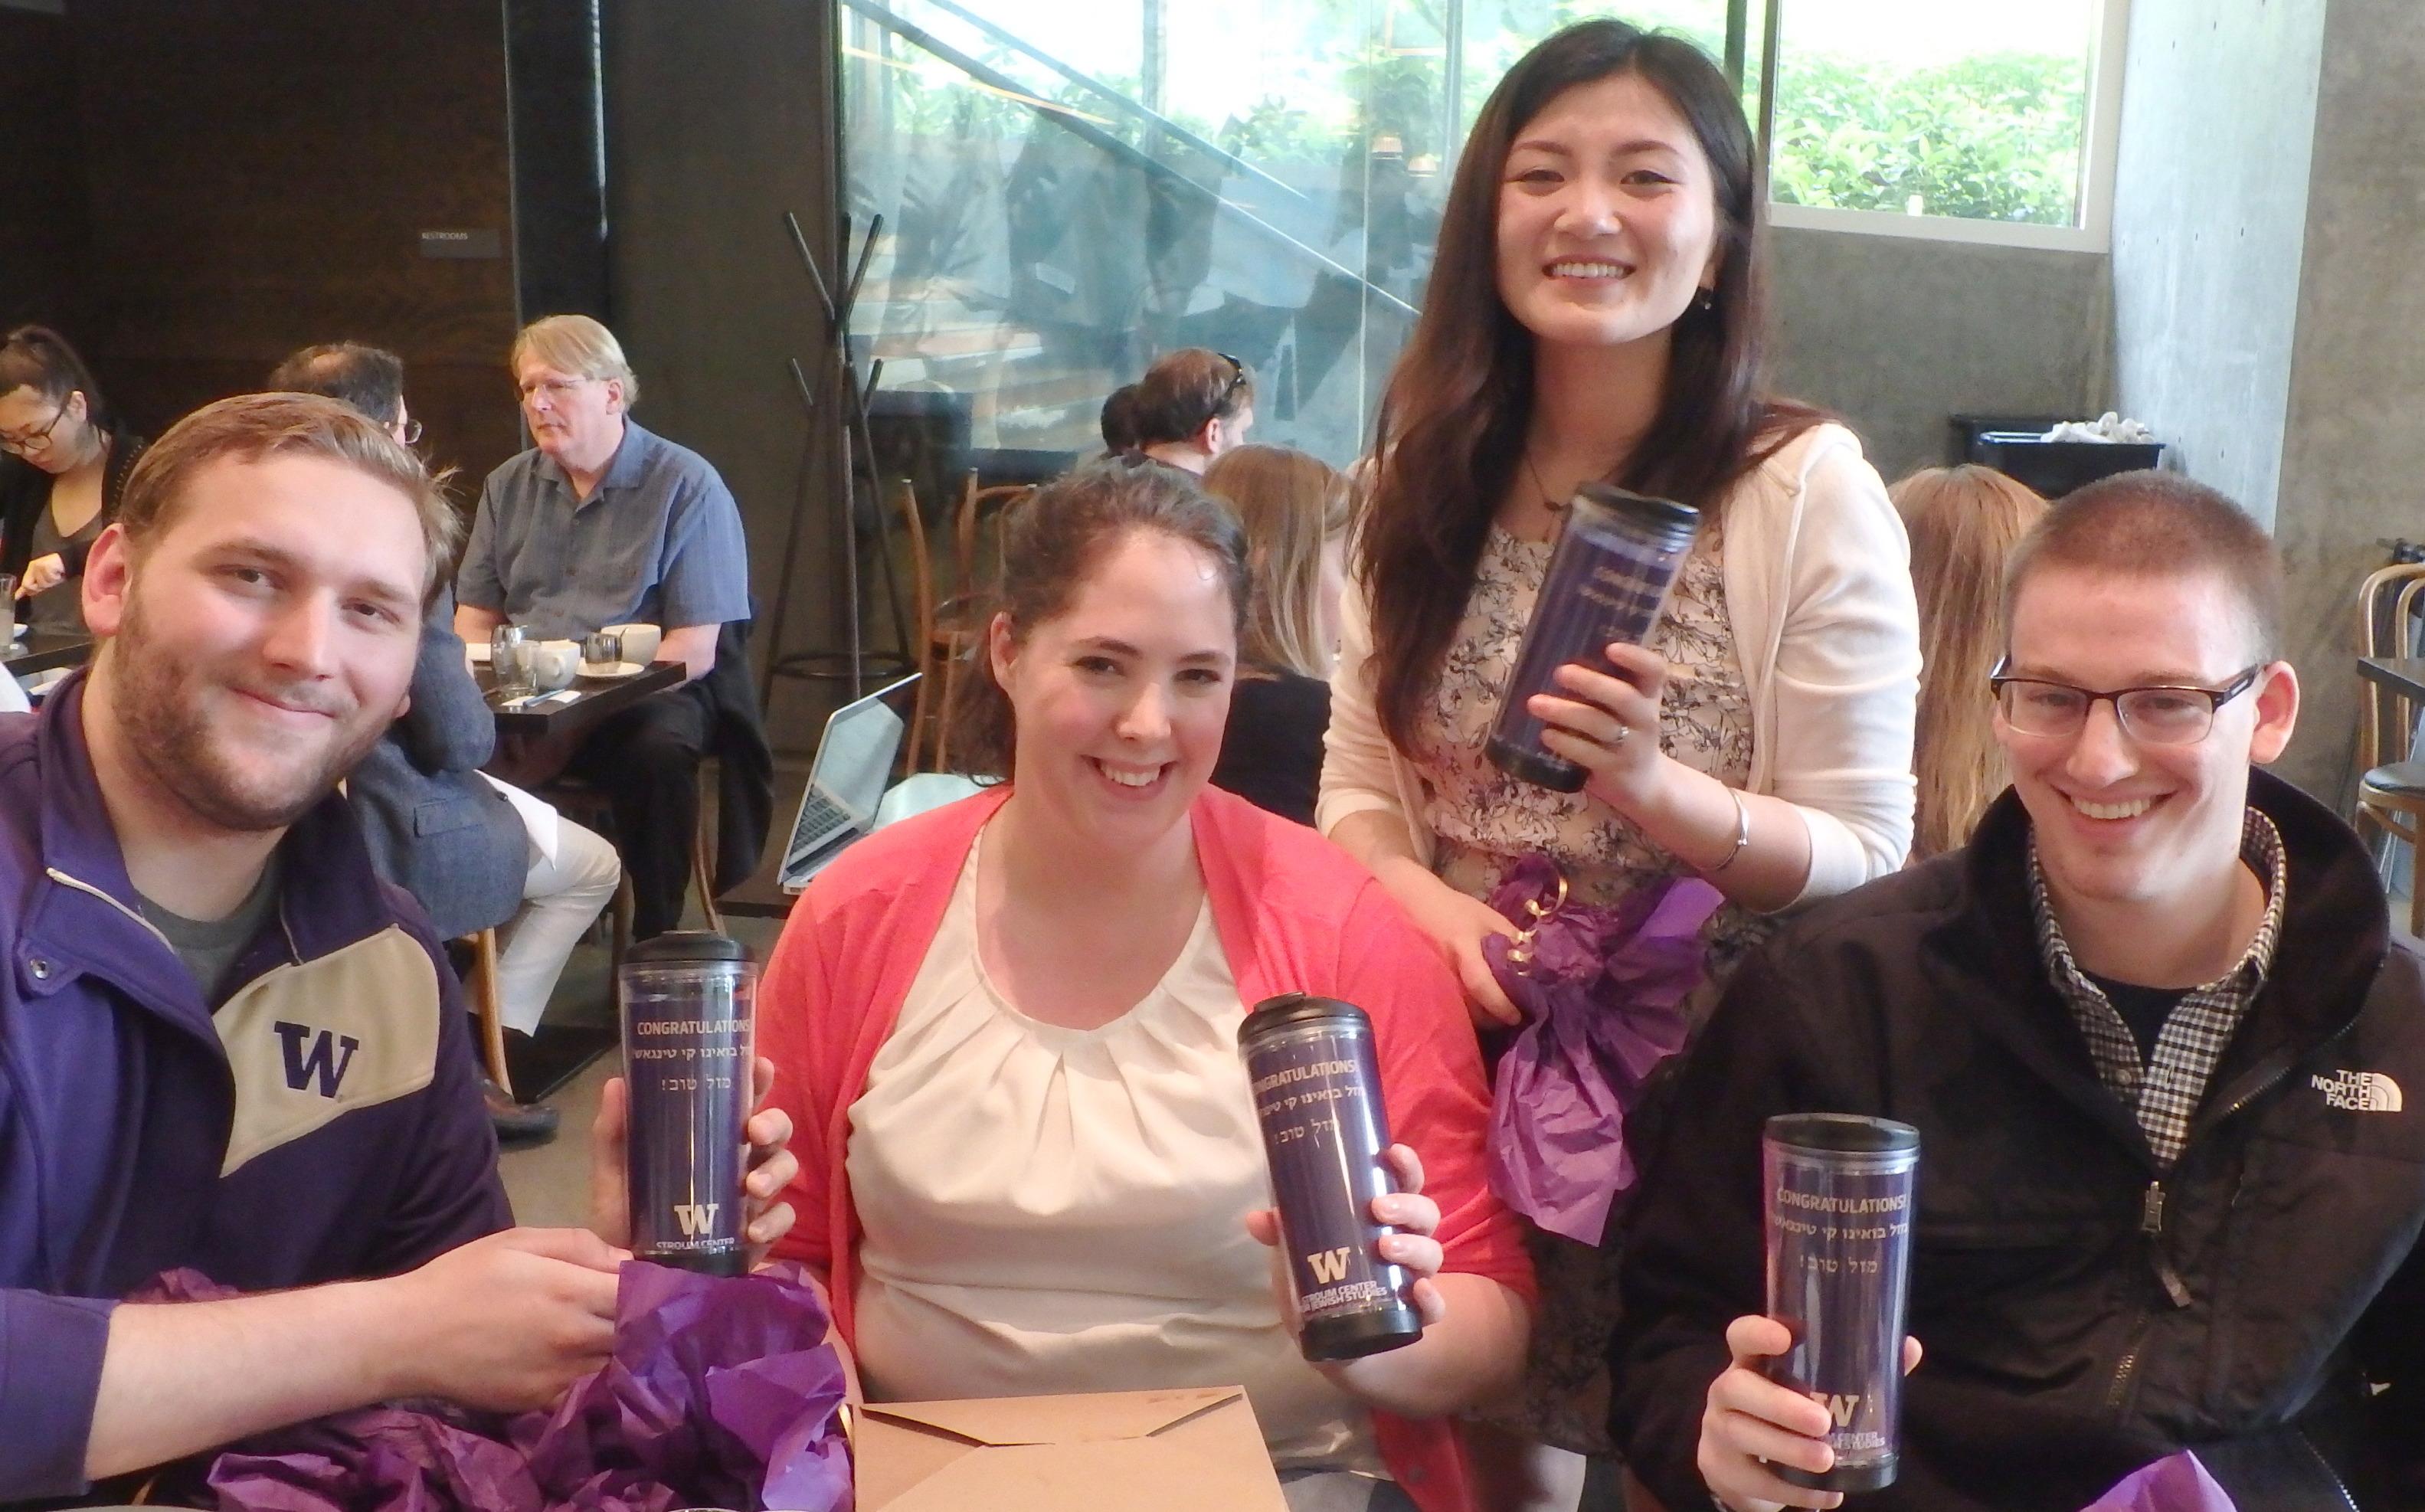 Jewish Studies majors at a lunch celebration, June 2015. From left: Chase Landrey, Katy Stoner, Dawn (Hui) Yang, and Josh Etsekson.